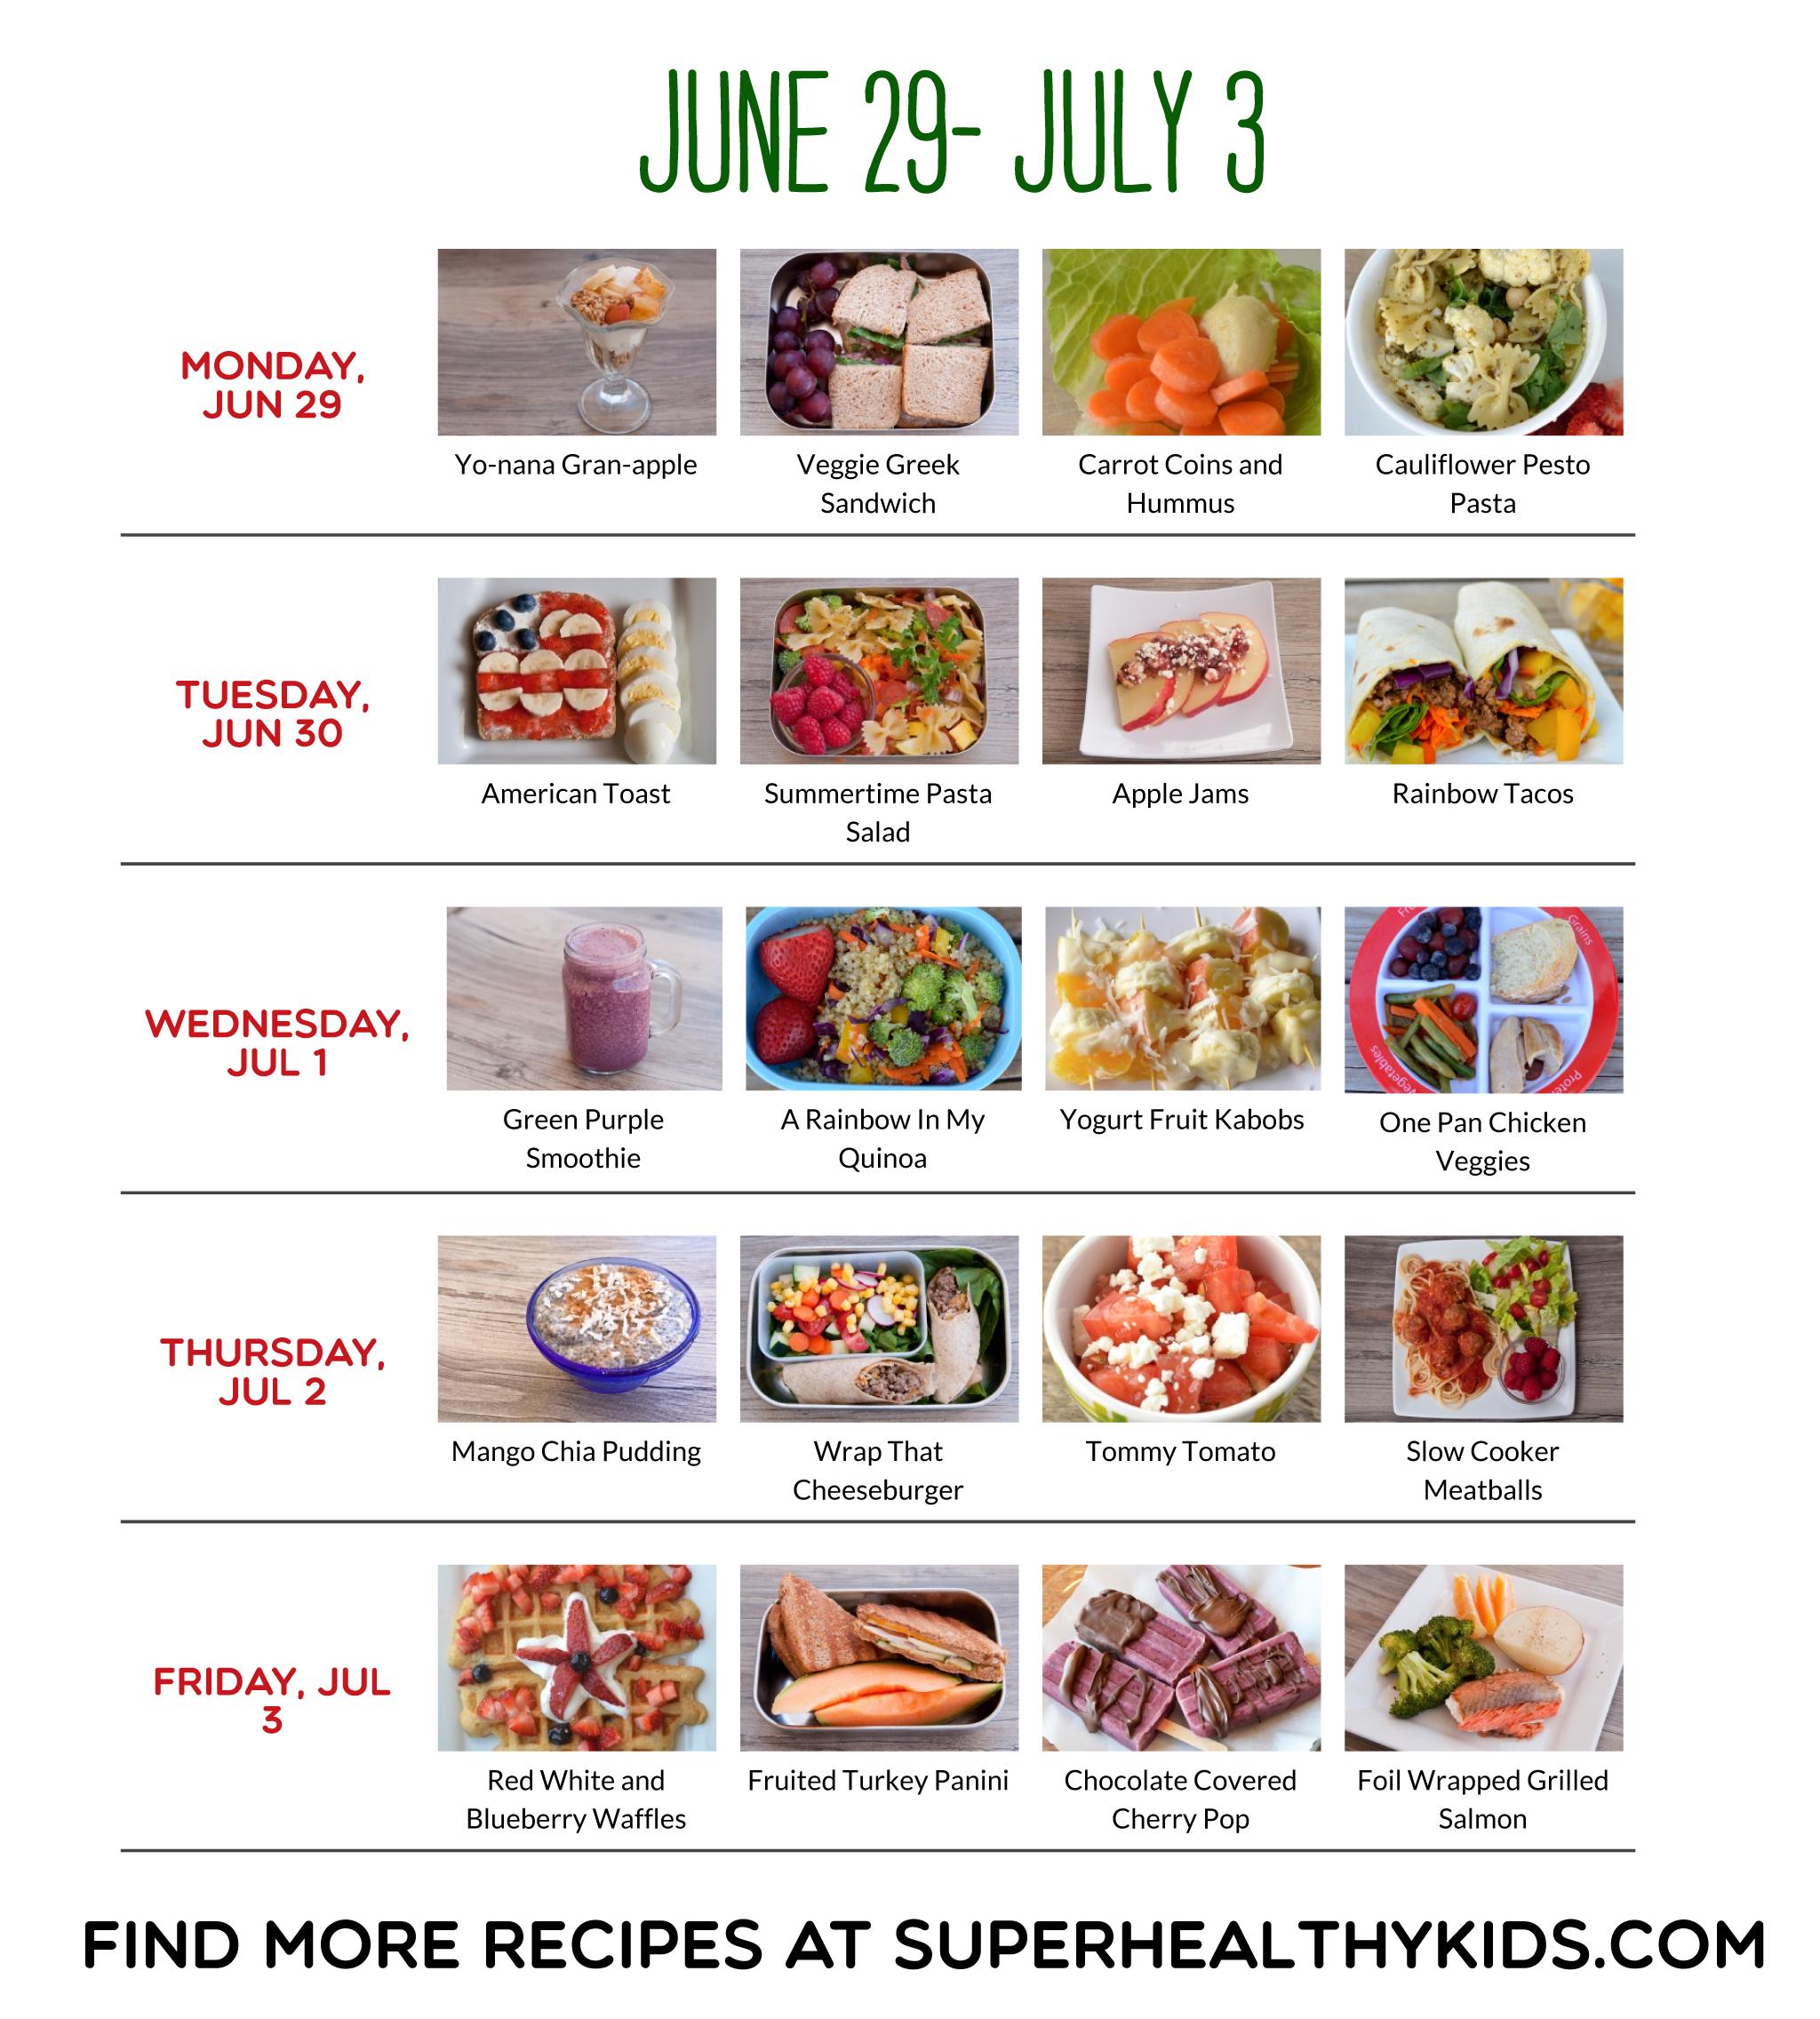 June 29-July 3 sample meal plan